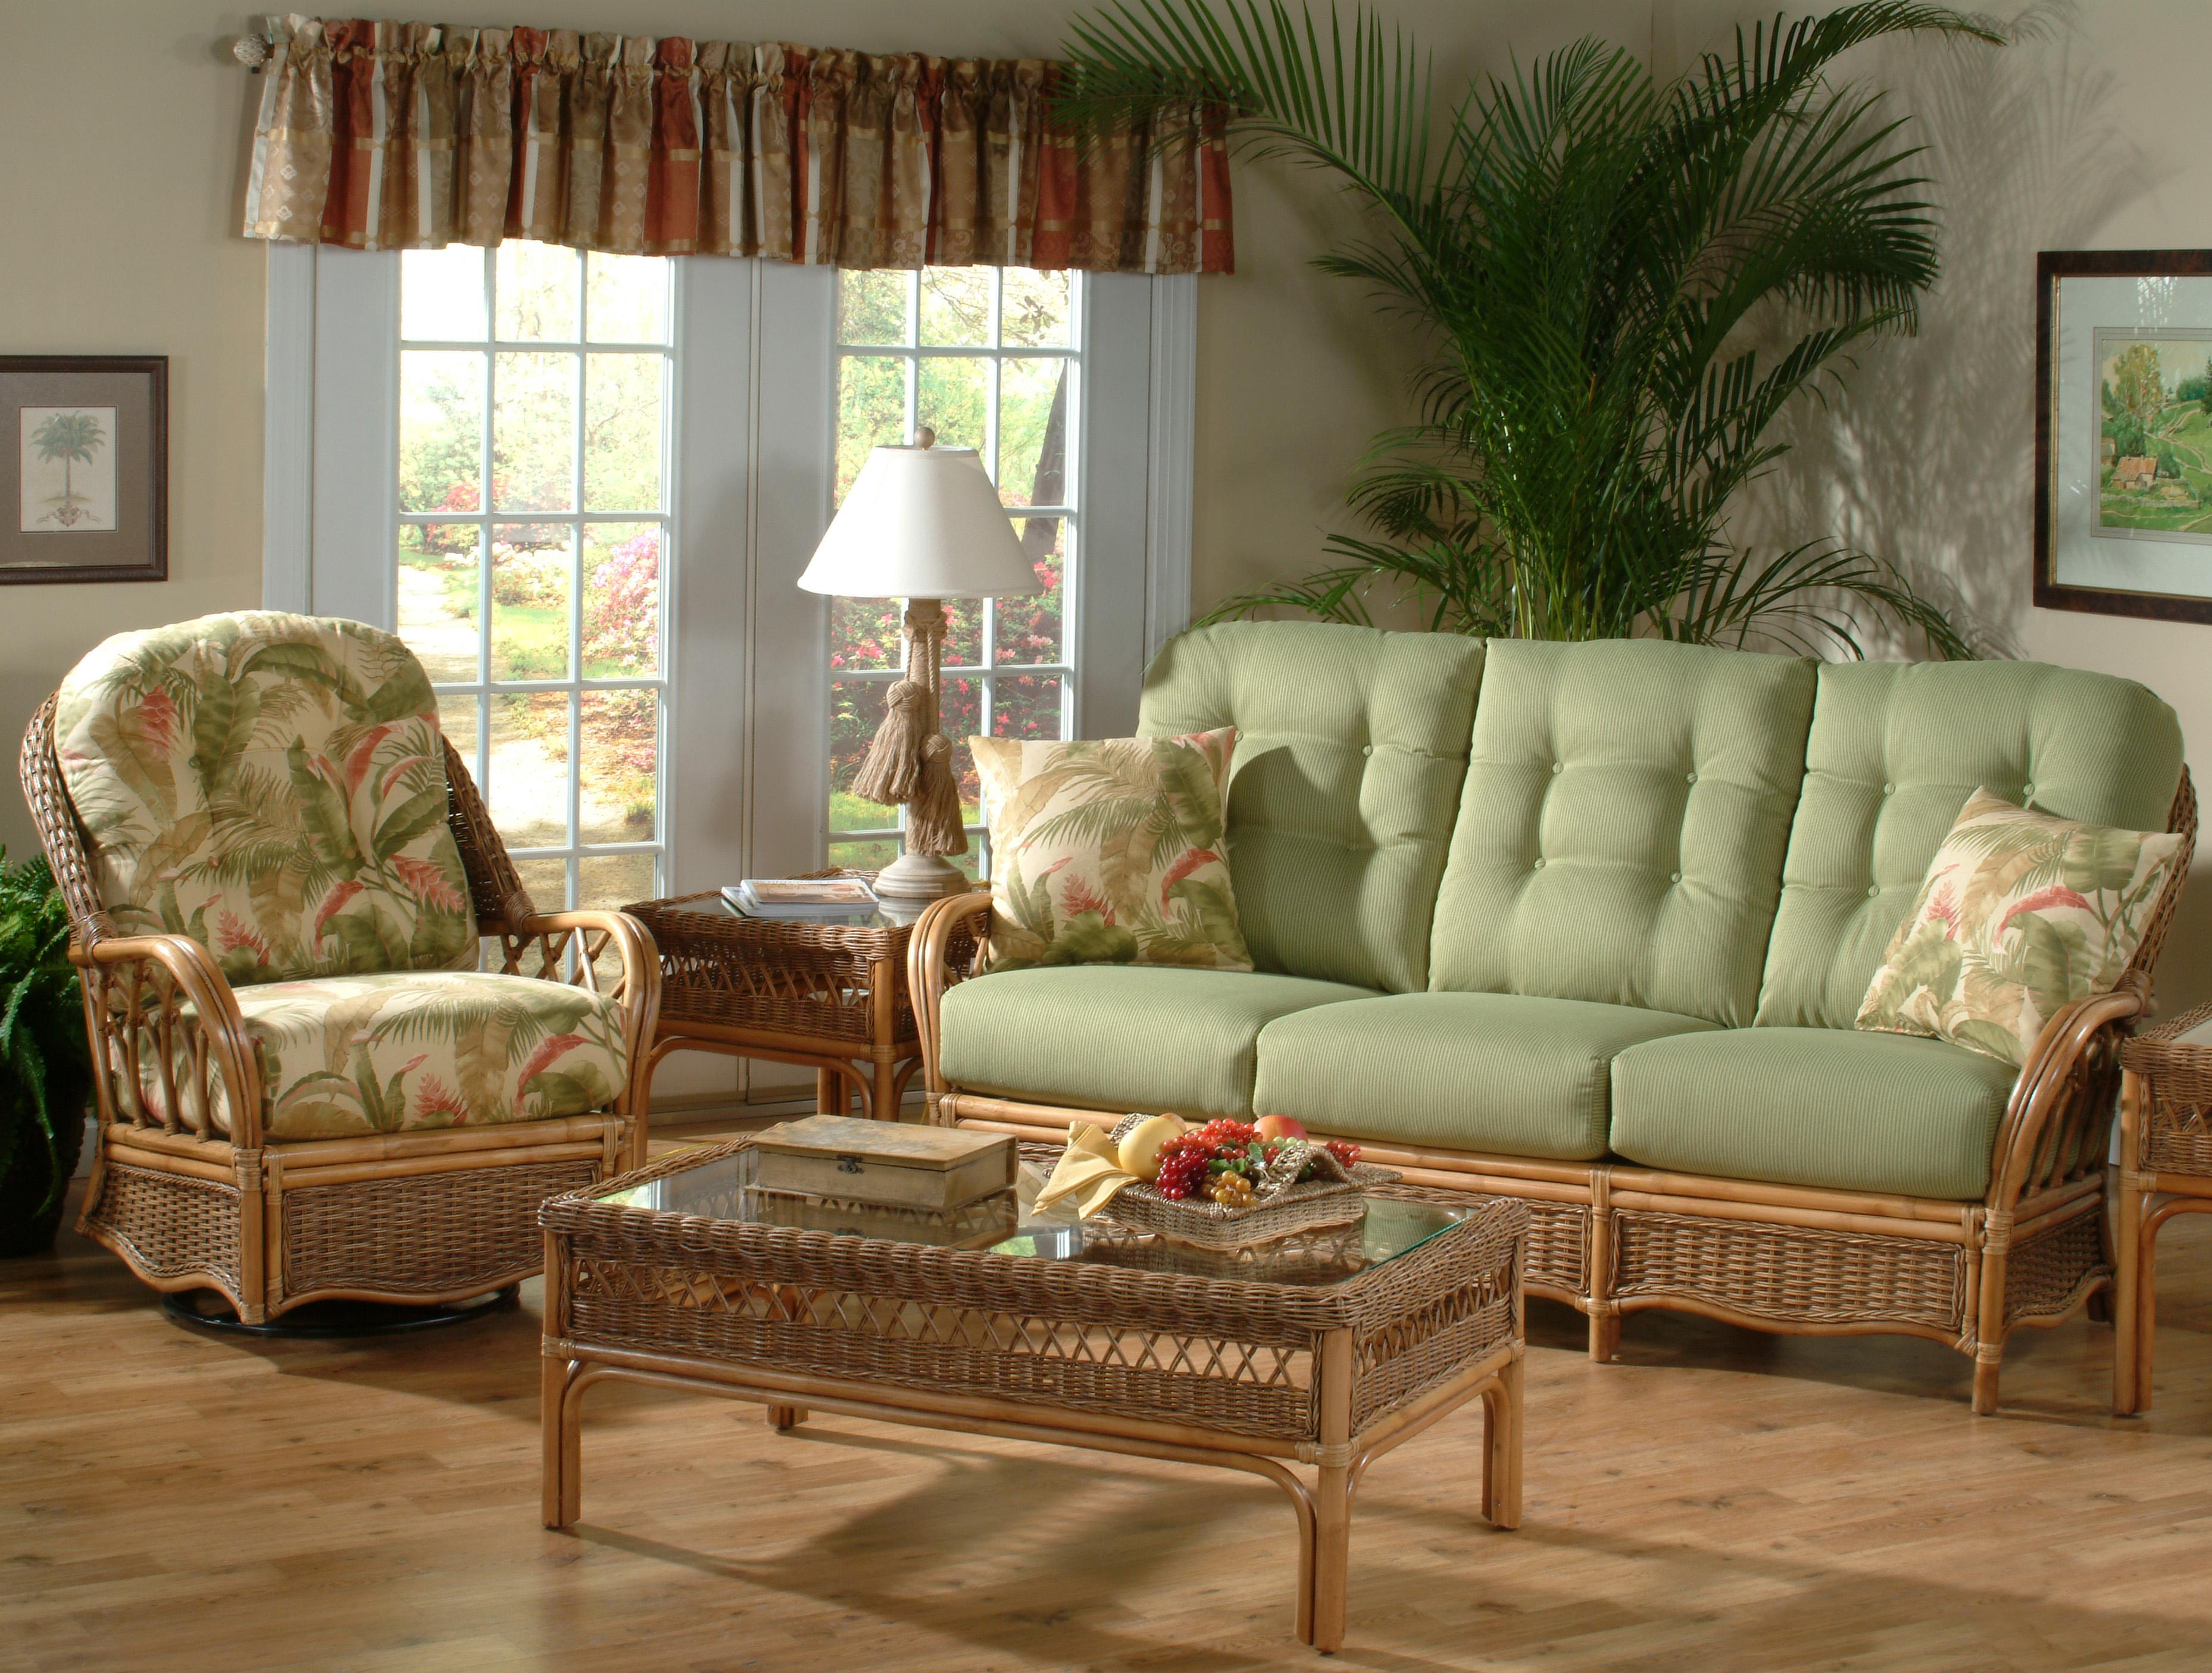 Braxton Culler Everglade Tropical Style Everglade Swivel